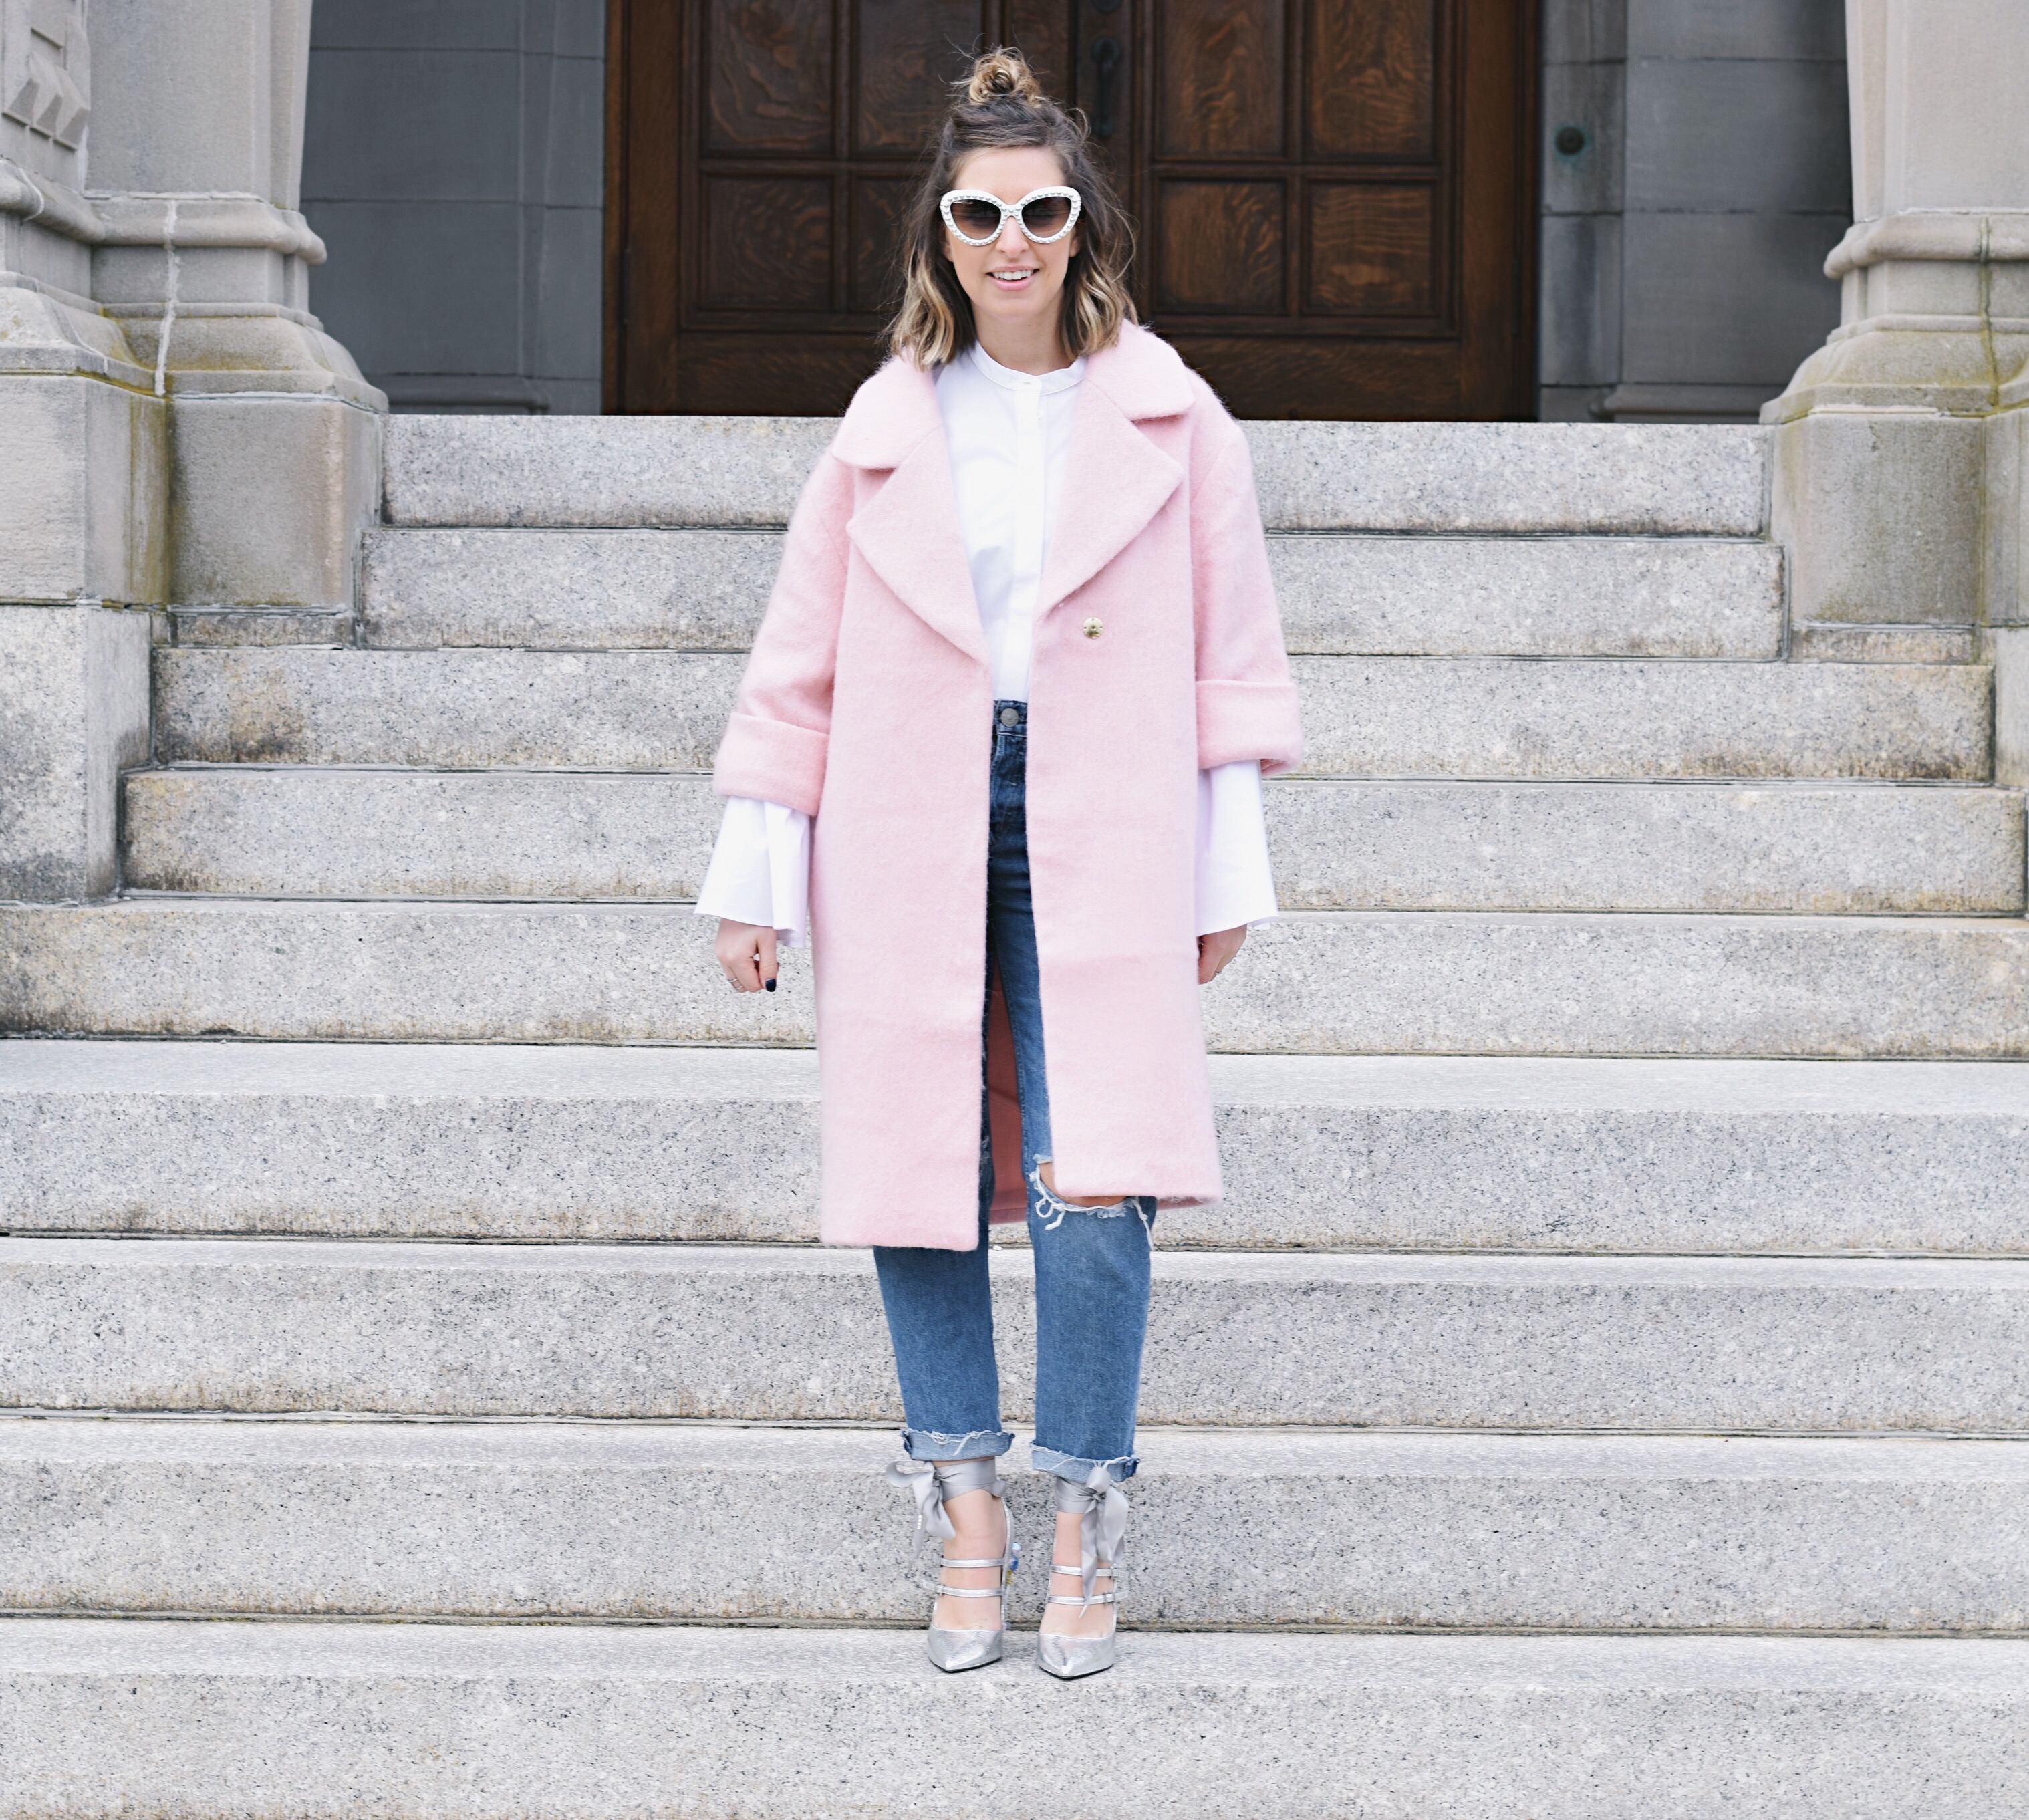 wearing feminine pink coat for winter